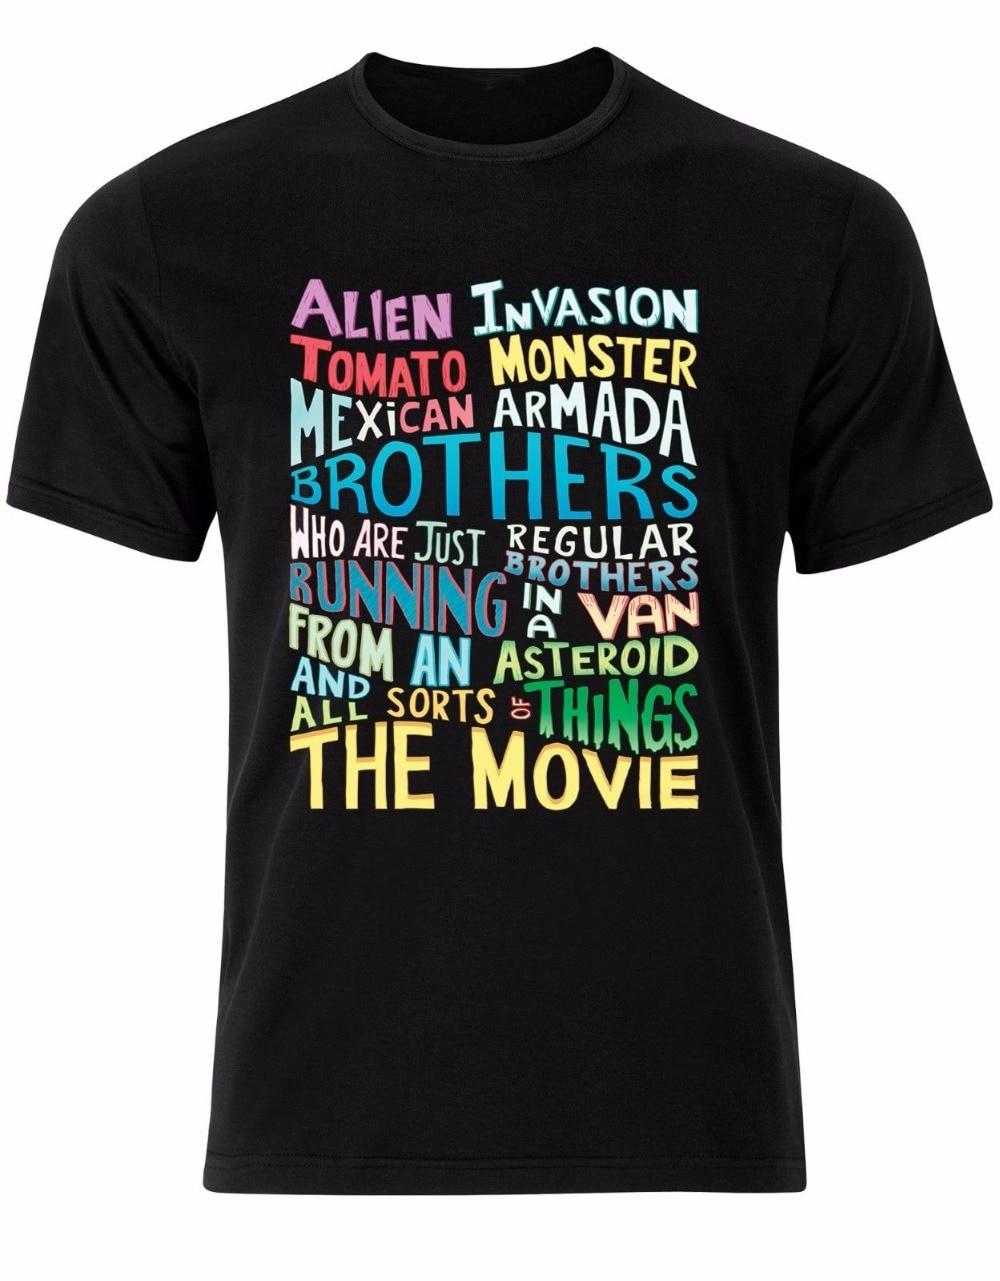 Tops Tee Shirts Mens Broadcloth Crew Neck Rick y MORTY Divertido frases Cool NUEVO POPULAR Sitcom Camiseta Hombre AL17 Shor